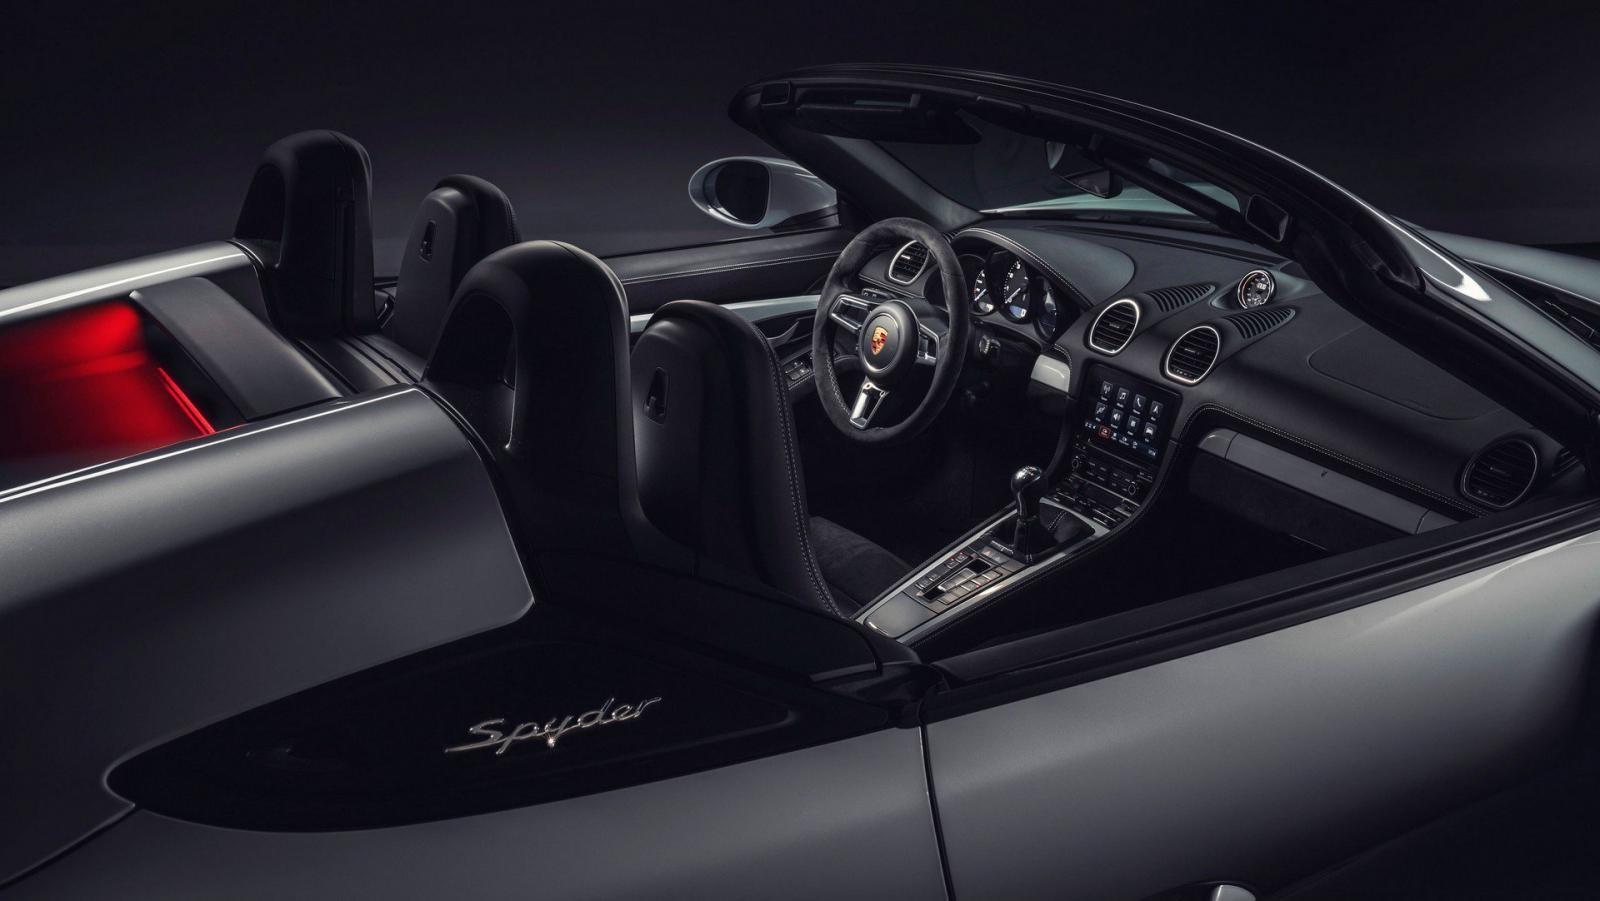 Nội thất bên trong Porsche 718 Boxster Spyder 2020